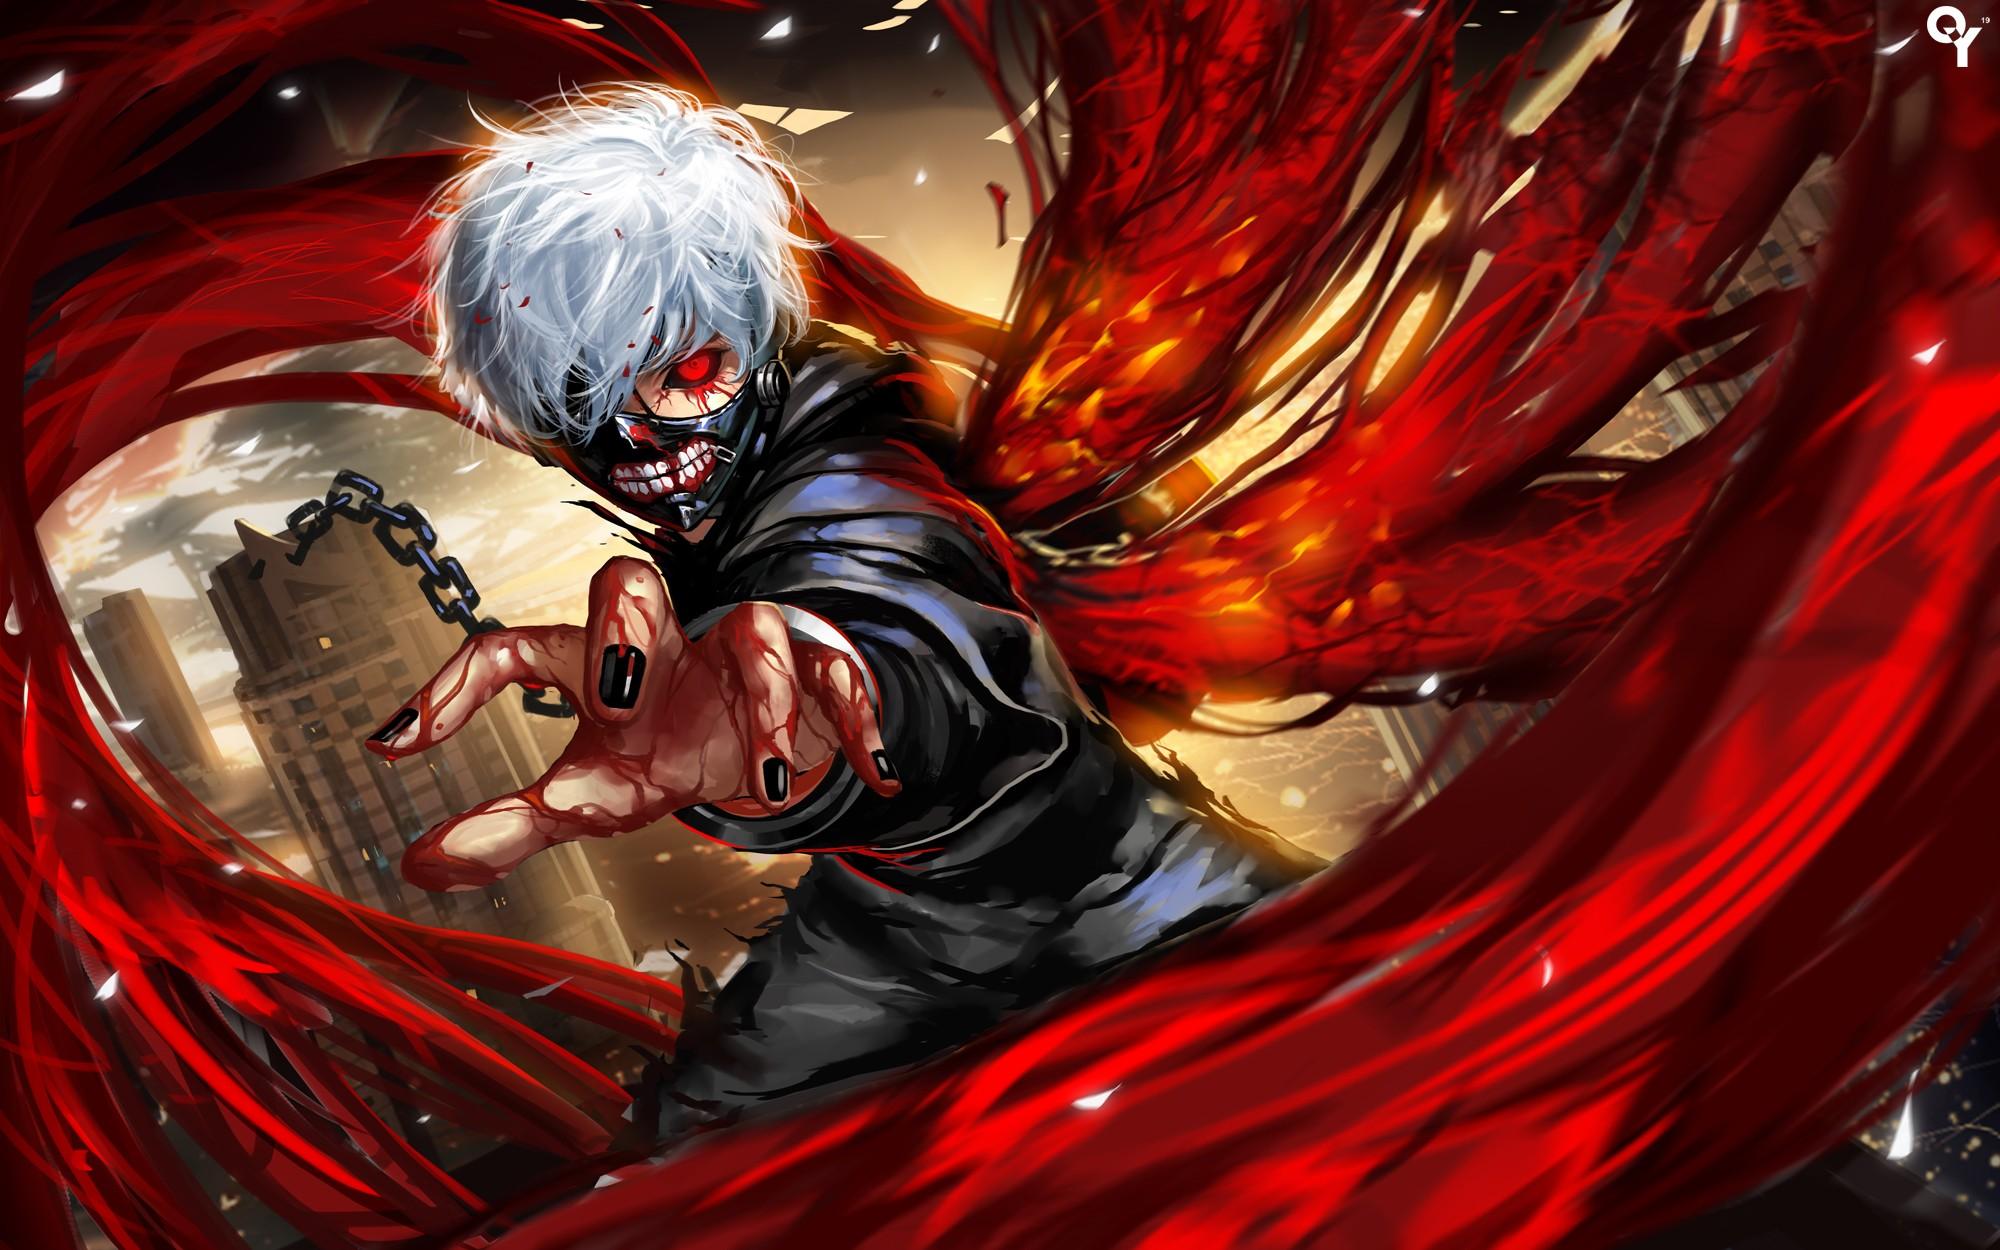 Wallpaper : Anime Boys, Red, Superhero, Kaneki Ken, Tokyo